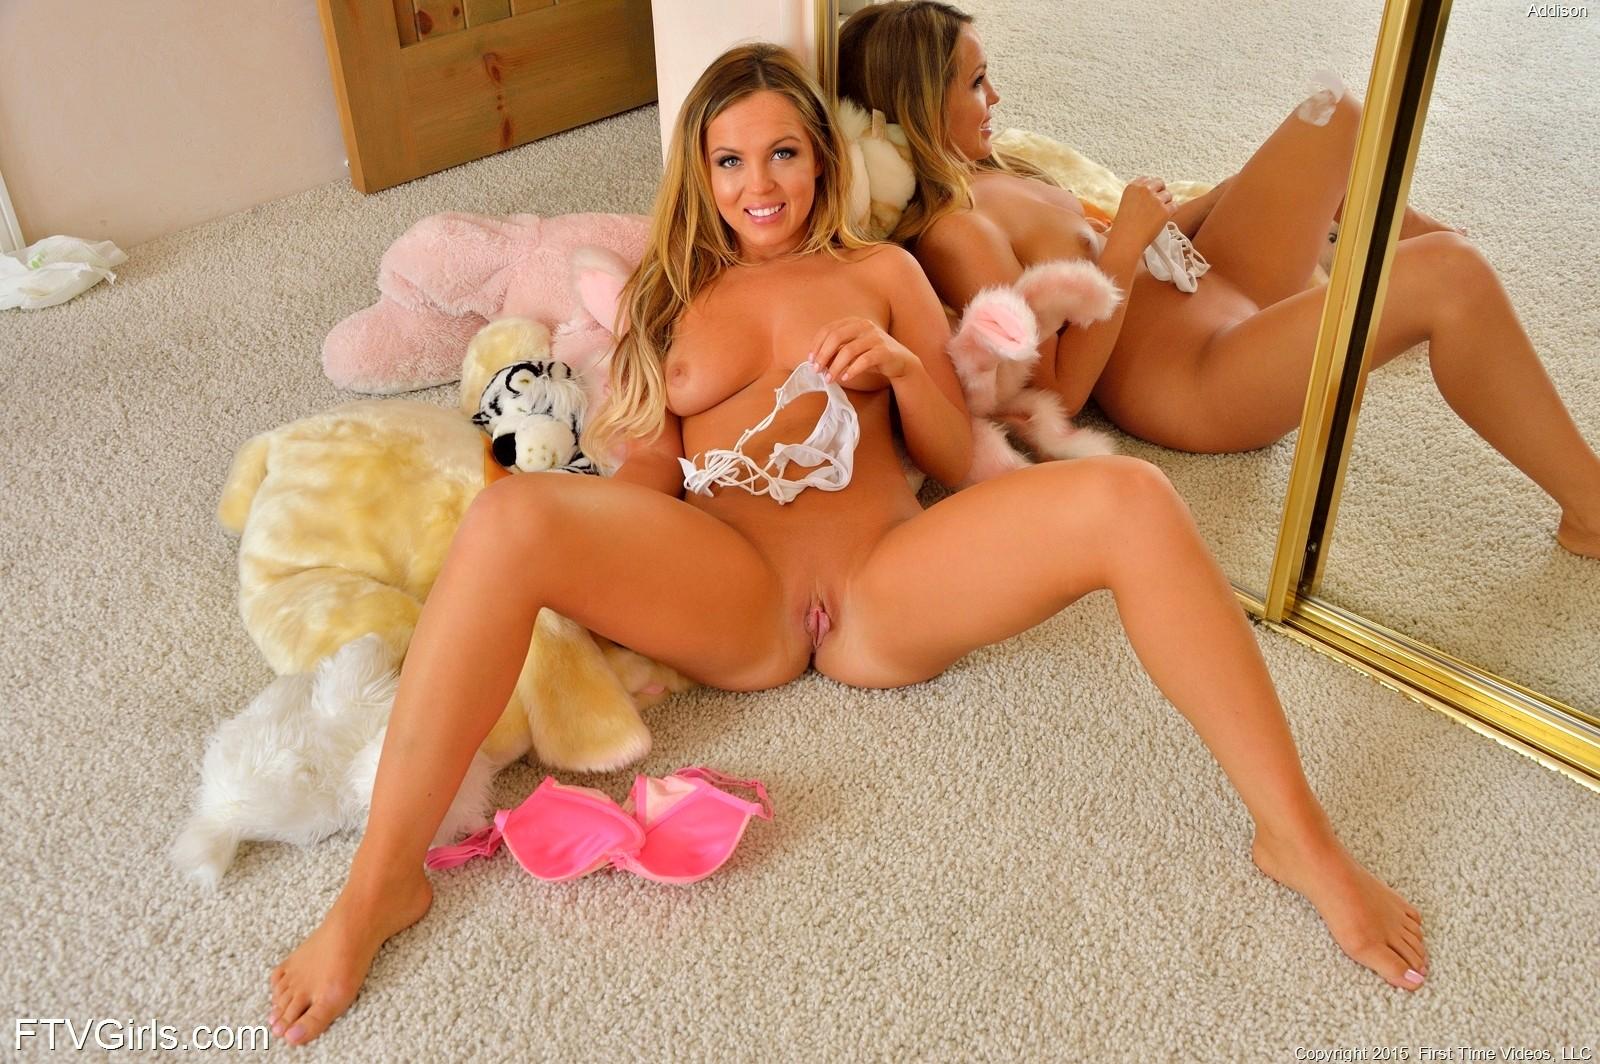 Ftv girls aubrey addison amateur babe